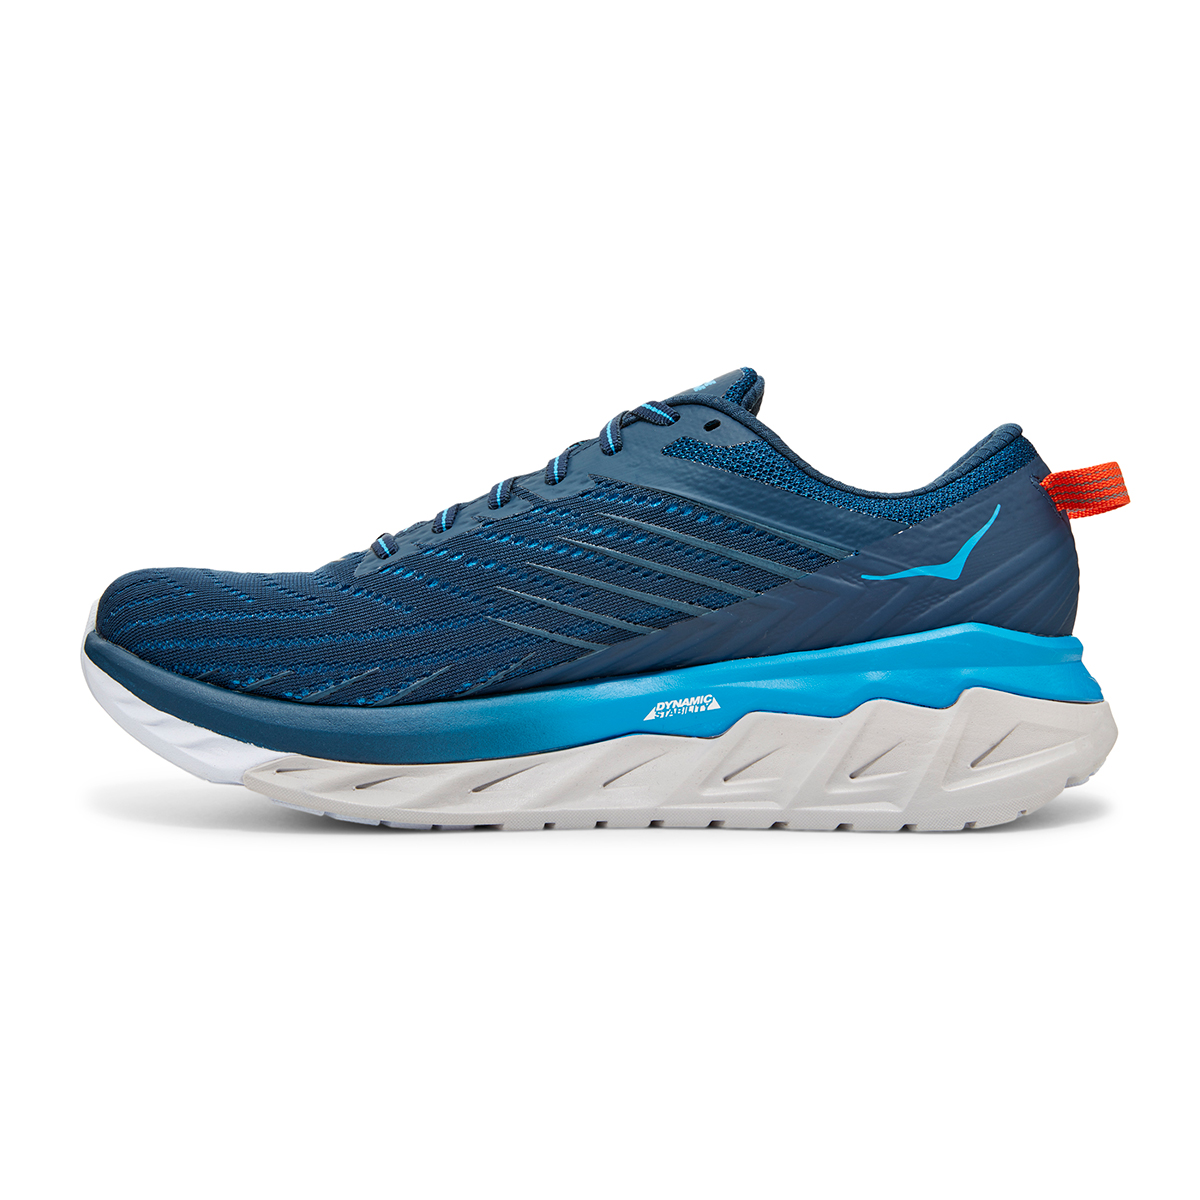 Men's Hoka One One Arahi 4 Running Shoe - Color: Majolica Blue/Dresden Blue (Regular Width) - Size: 7, Majolica Blue/Dresden Blue, large, image 2